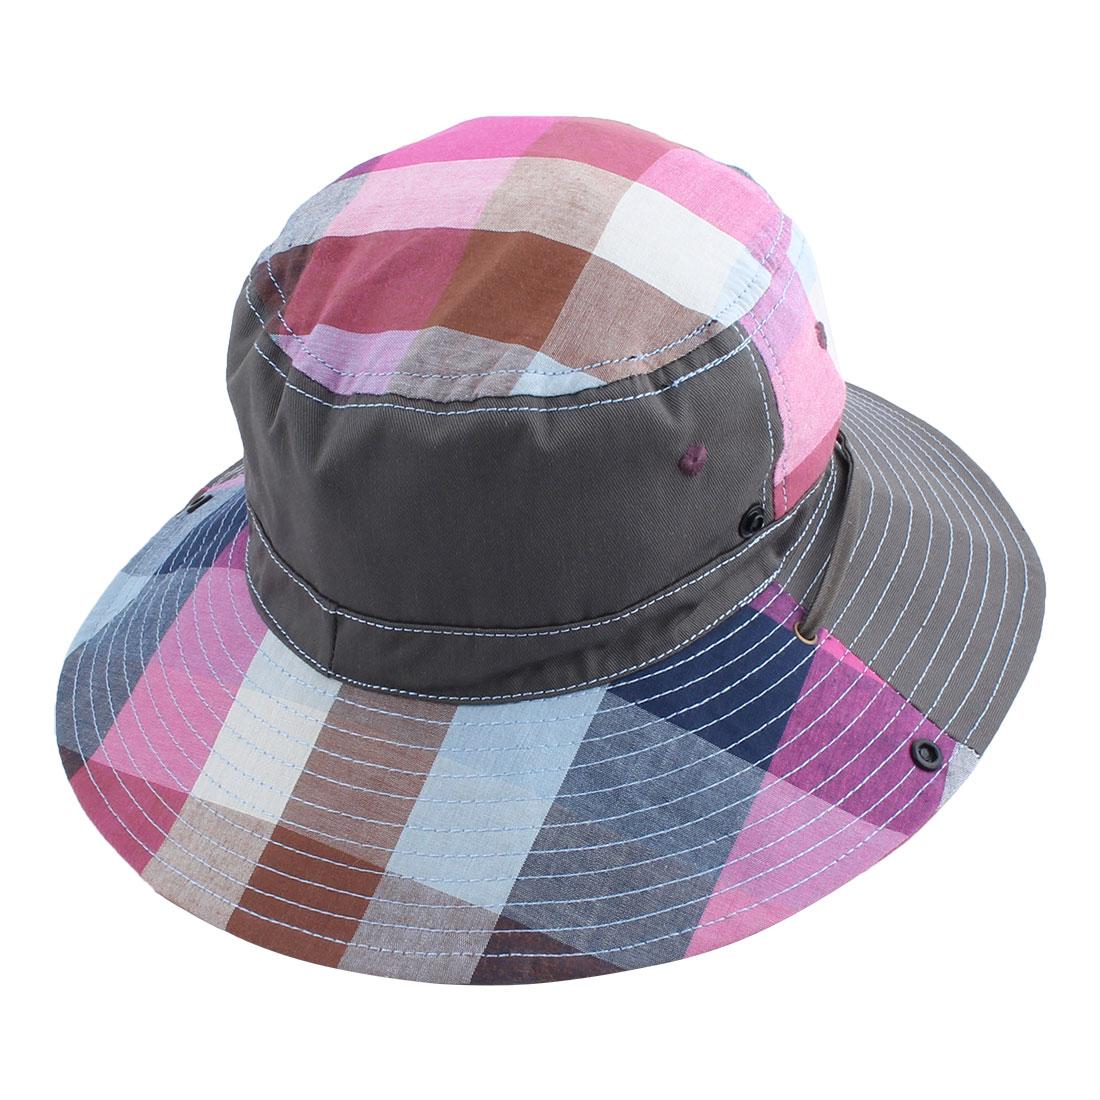 Fisherman Outdoor Fishing Hiking Picnic Holiday Plaid Pattern Wide Brim Cap Summer Beach Bucket Hat Dark Gray